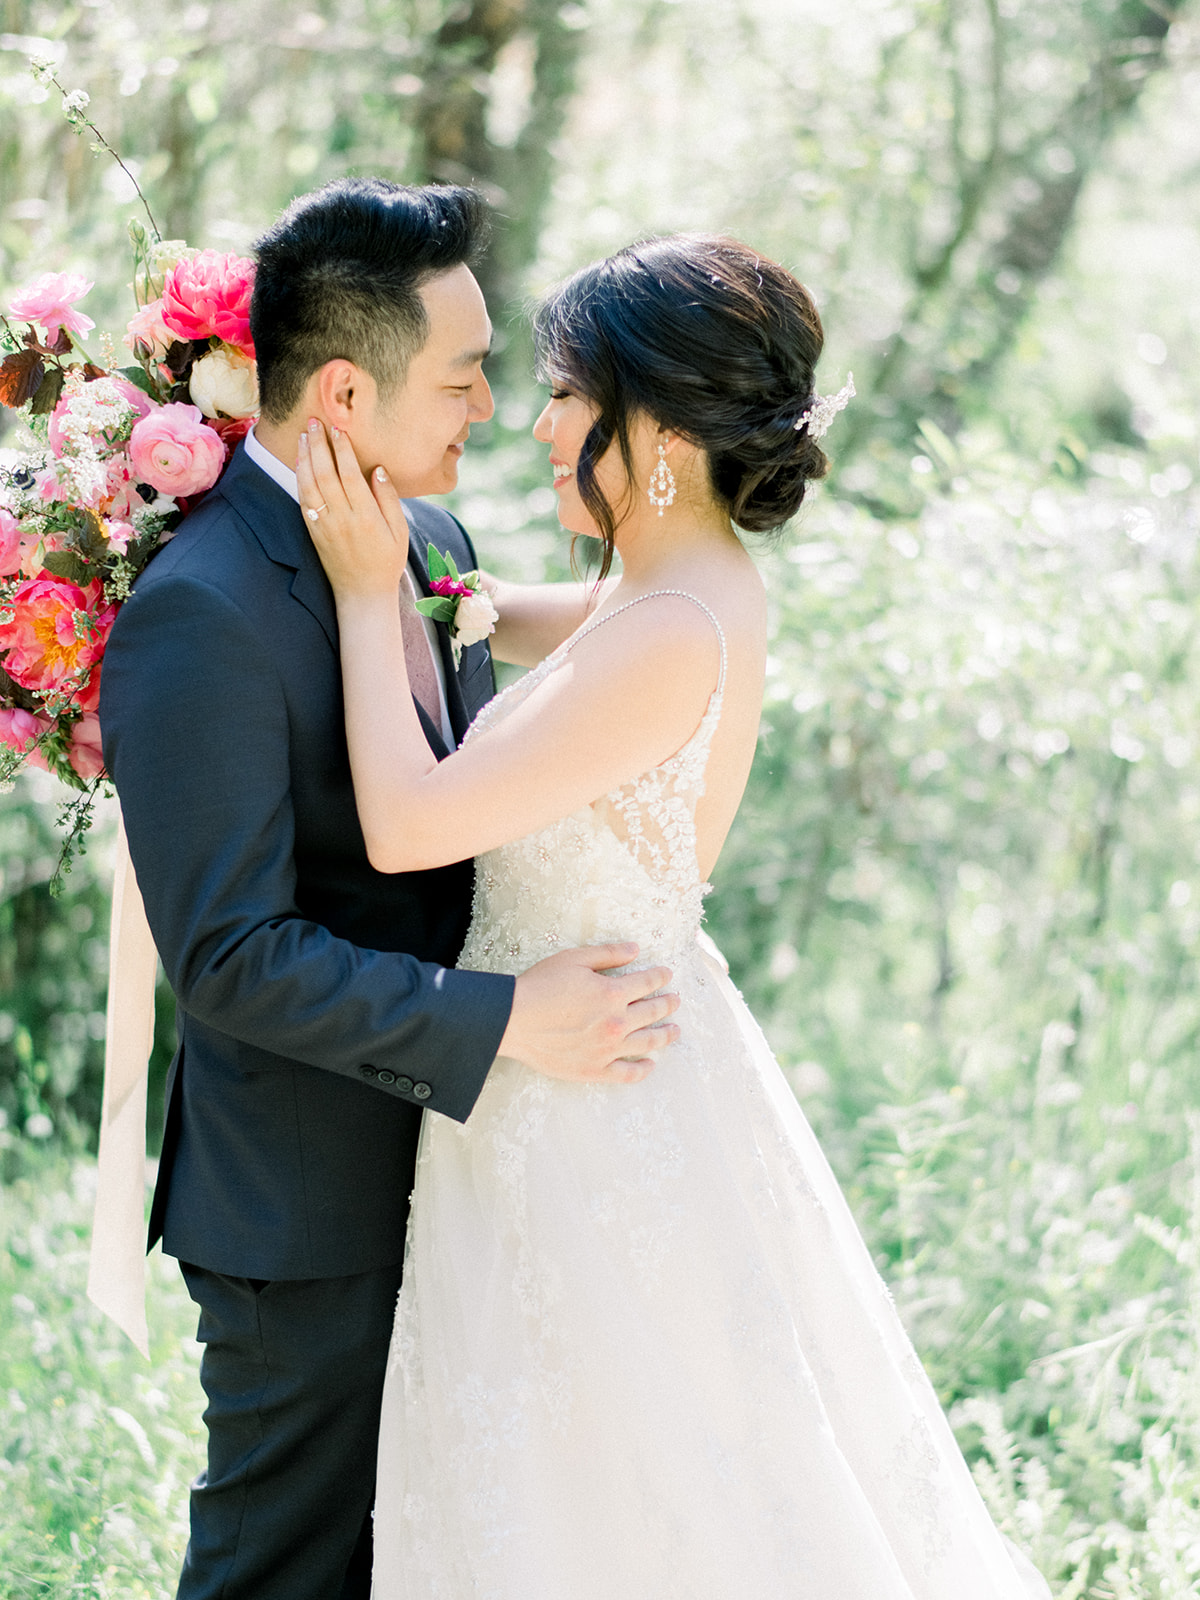 jueunandjon-etherandsmith-wedding-331.jpg